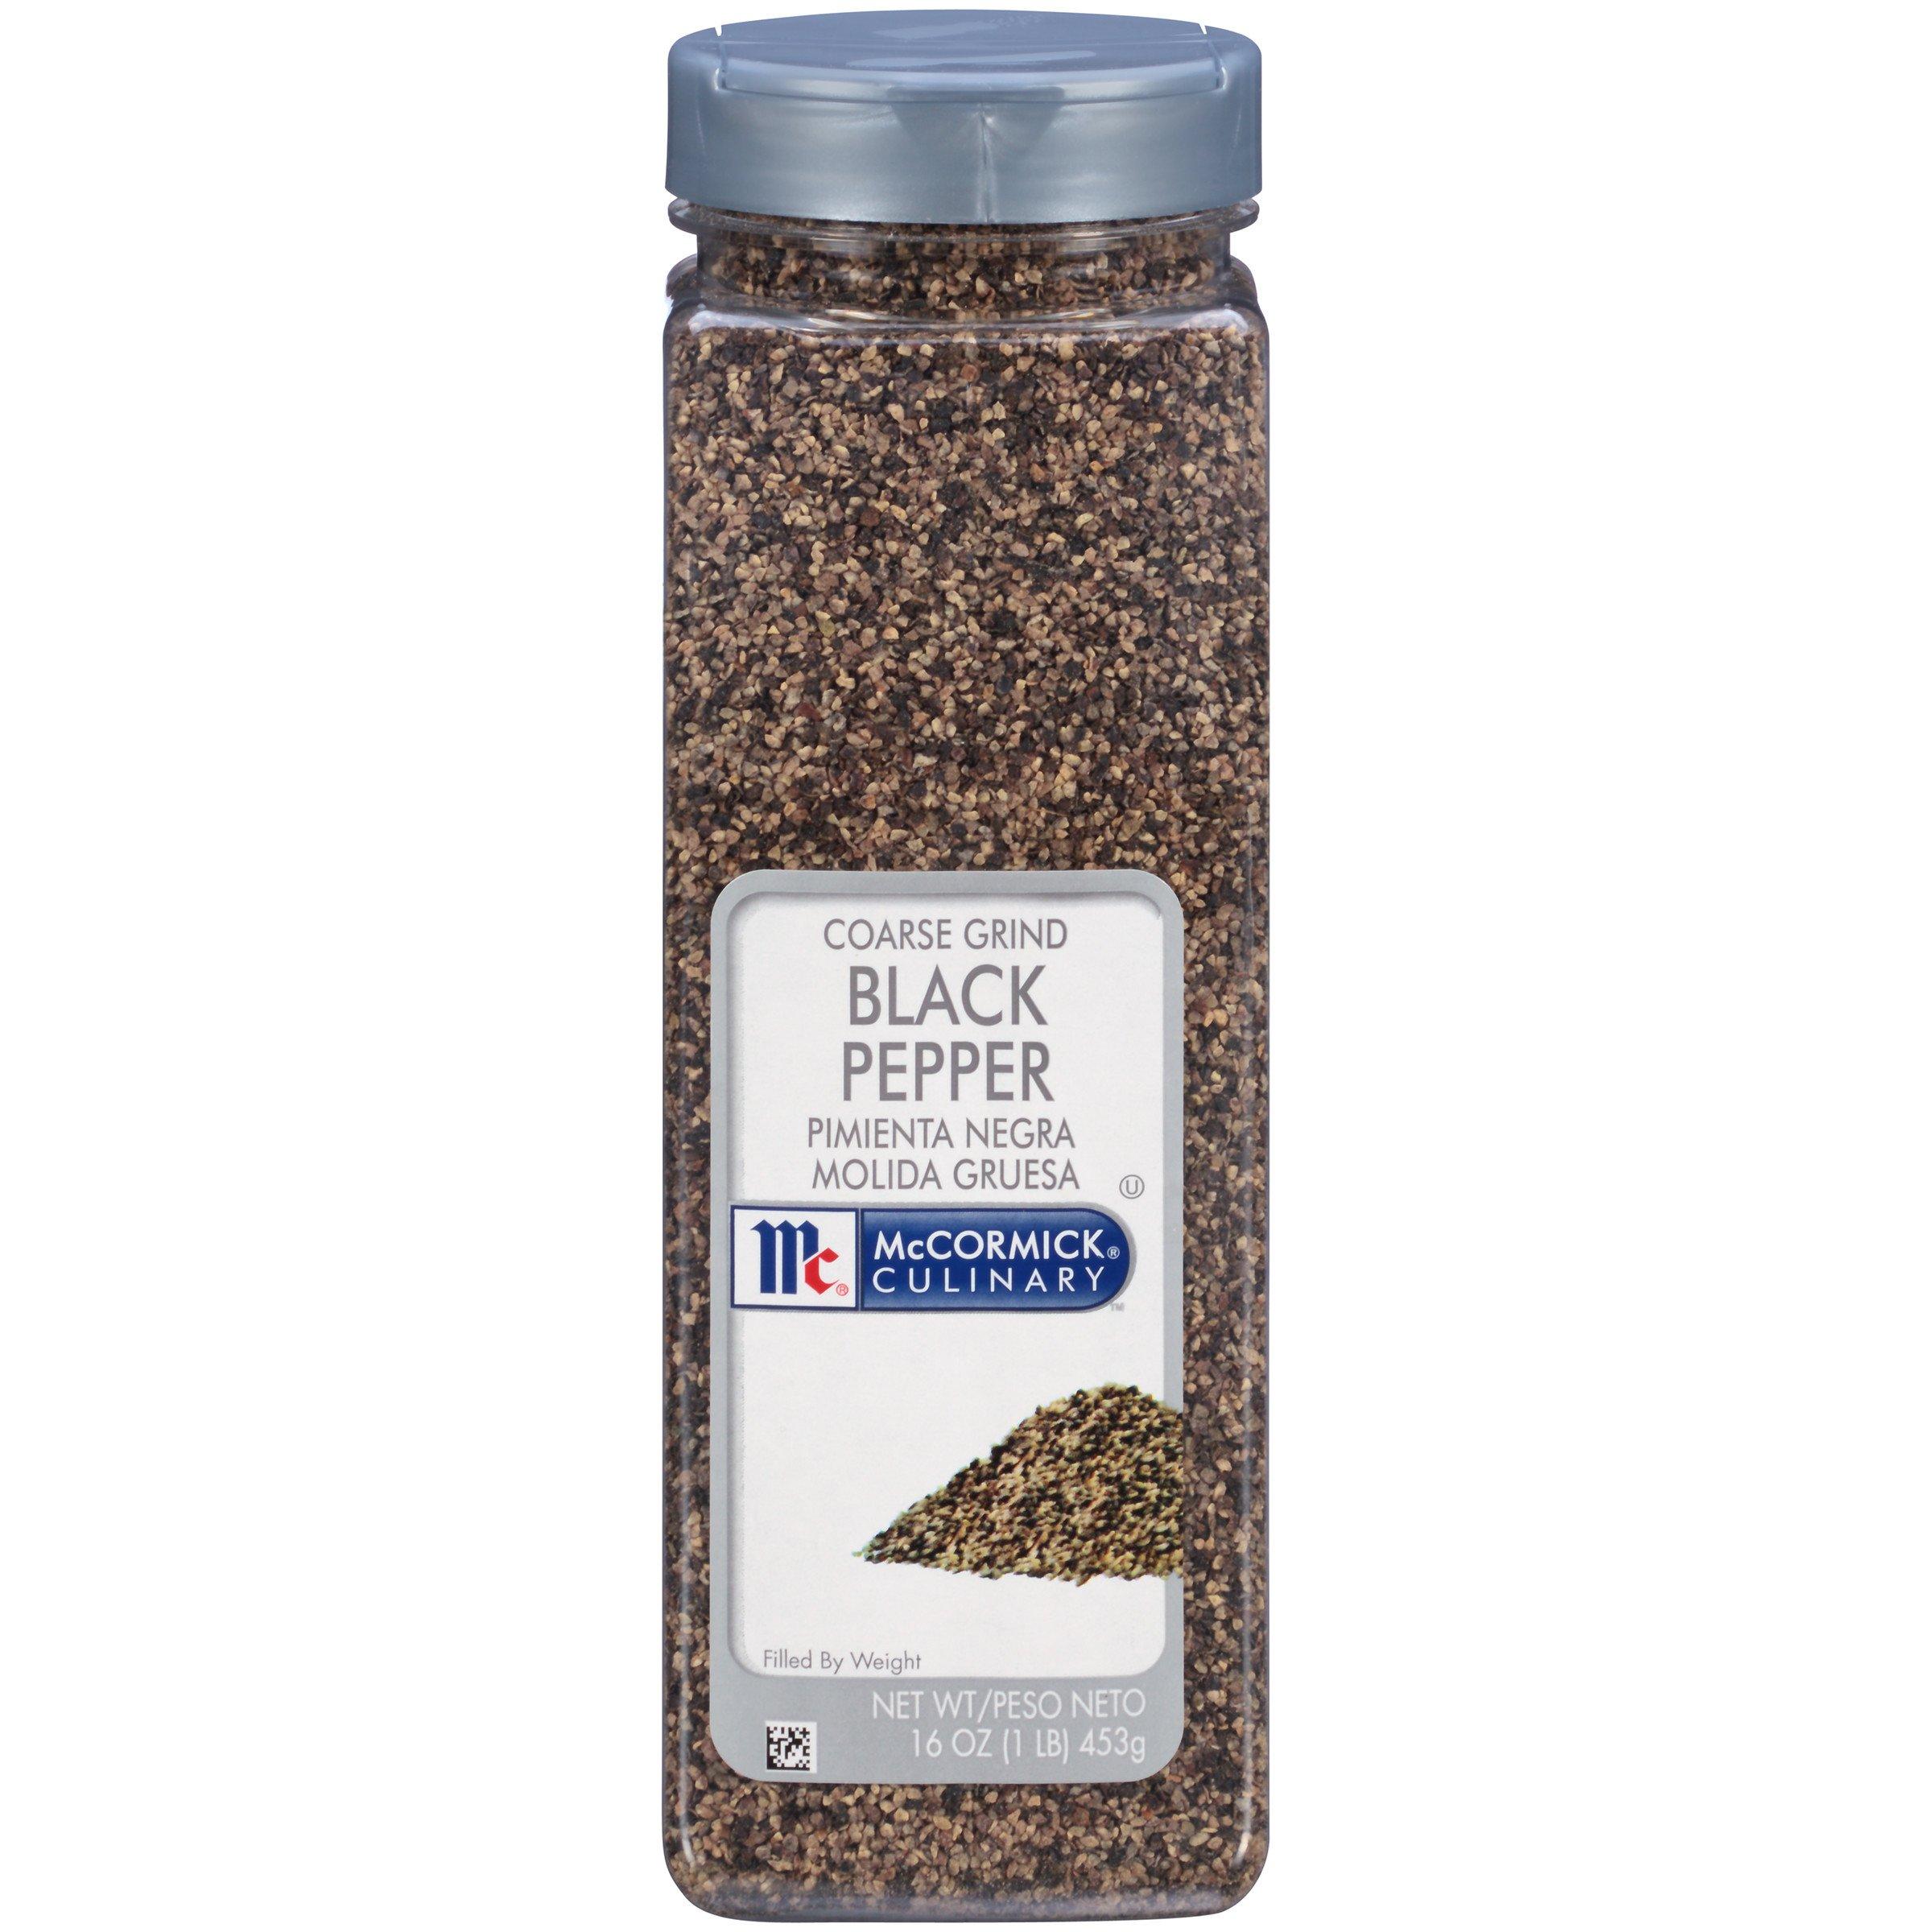 McCormick Culinary Coarse Grind Black Pepper, 16 oz